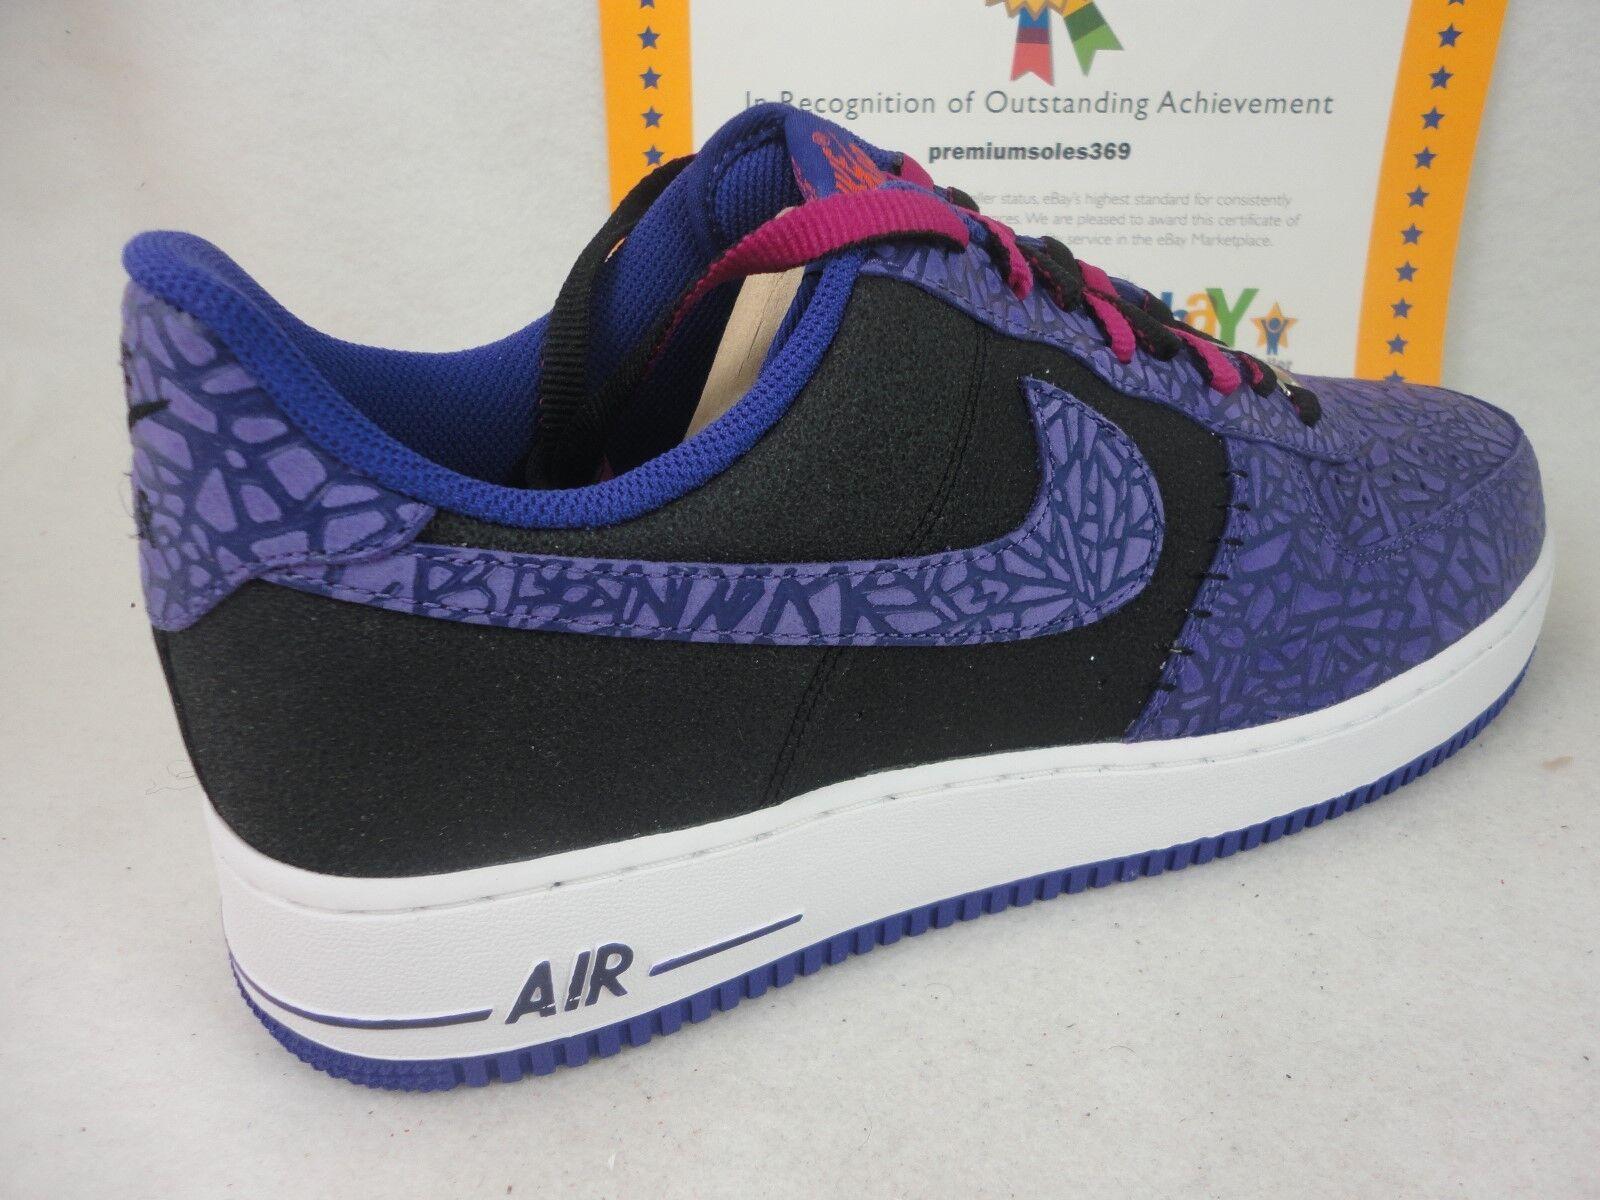 Nike Air Force 1,2013 Rare!!, Black / Court Purple, 488298 025, Size 14